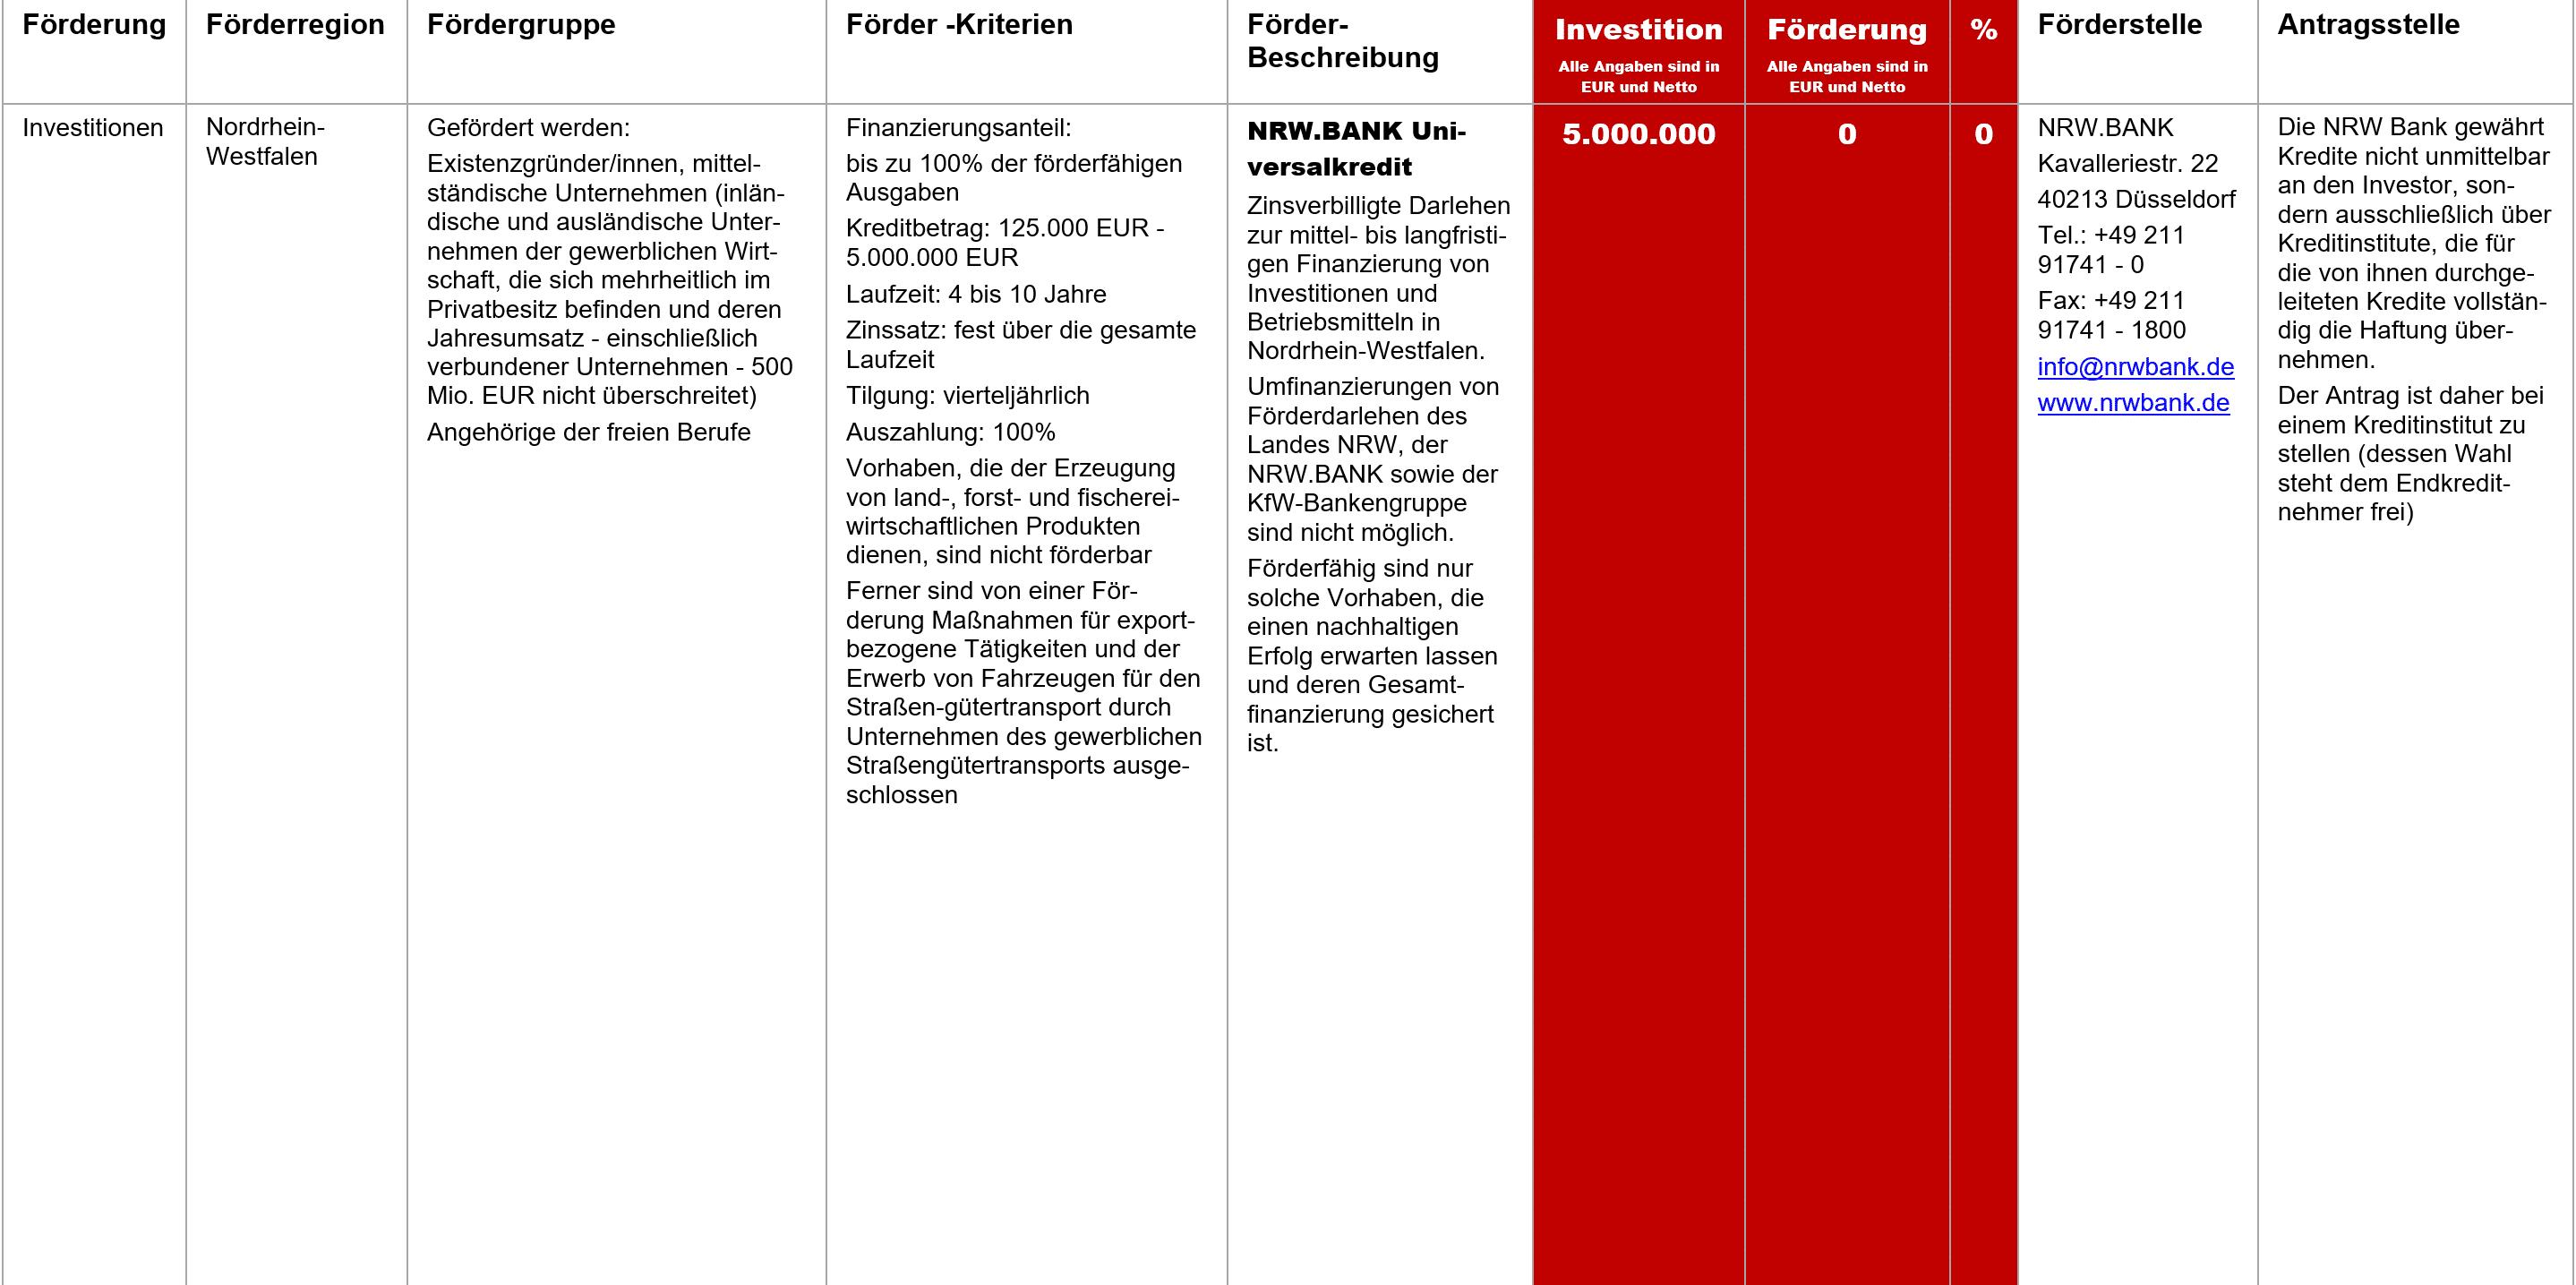 NRW BANK Universalkredit, Fördermittel – NRW.BANK Universalkredit